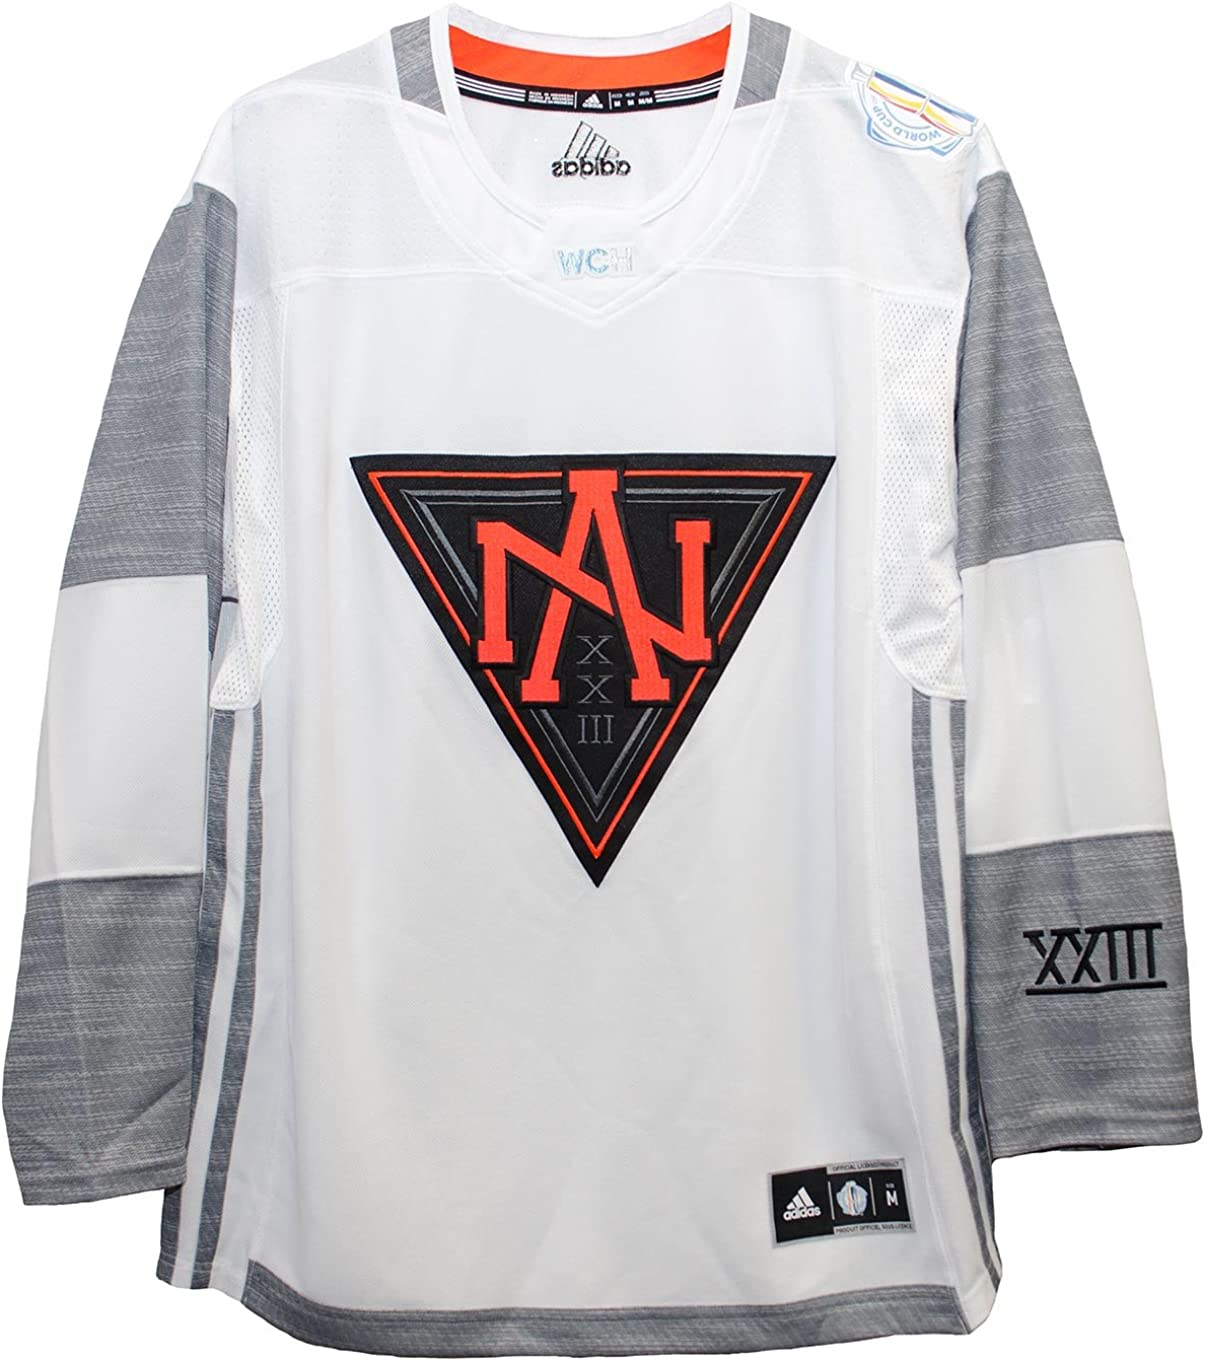 nhl jersey sales 2016